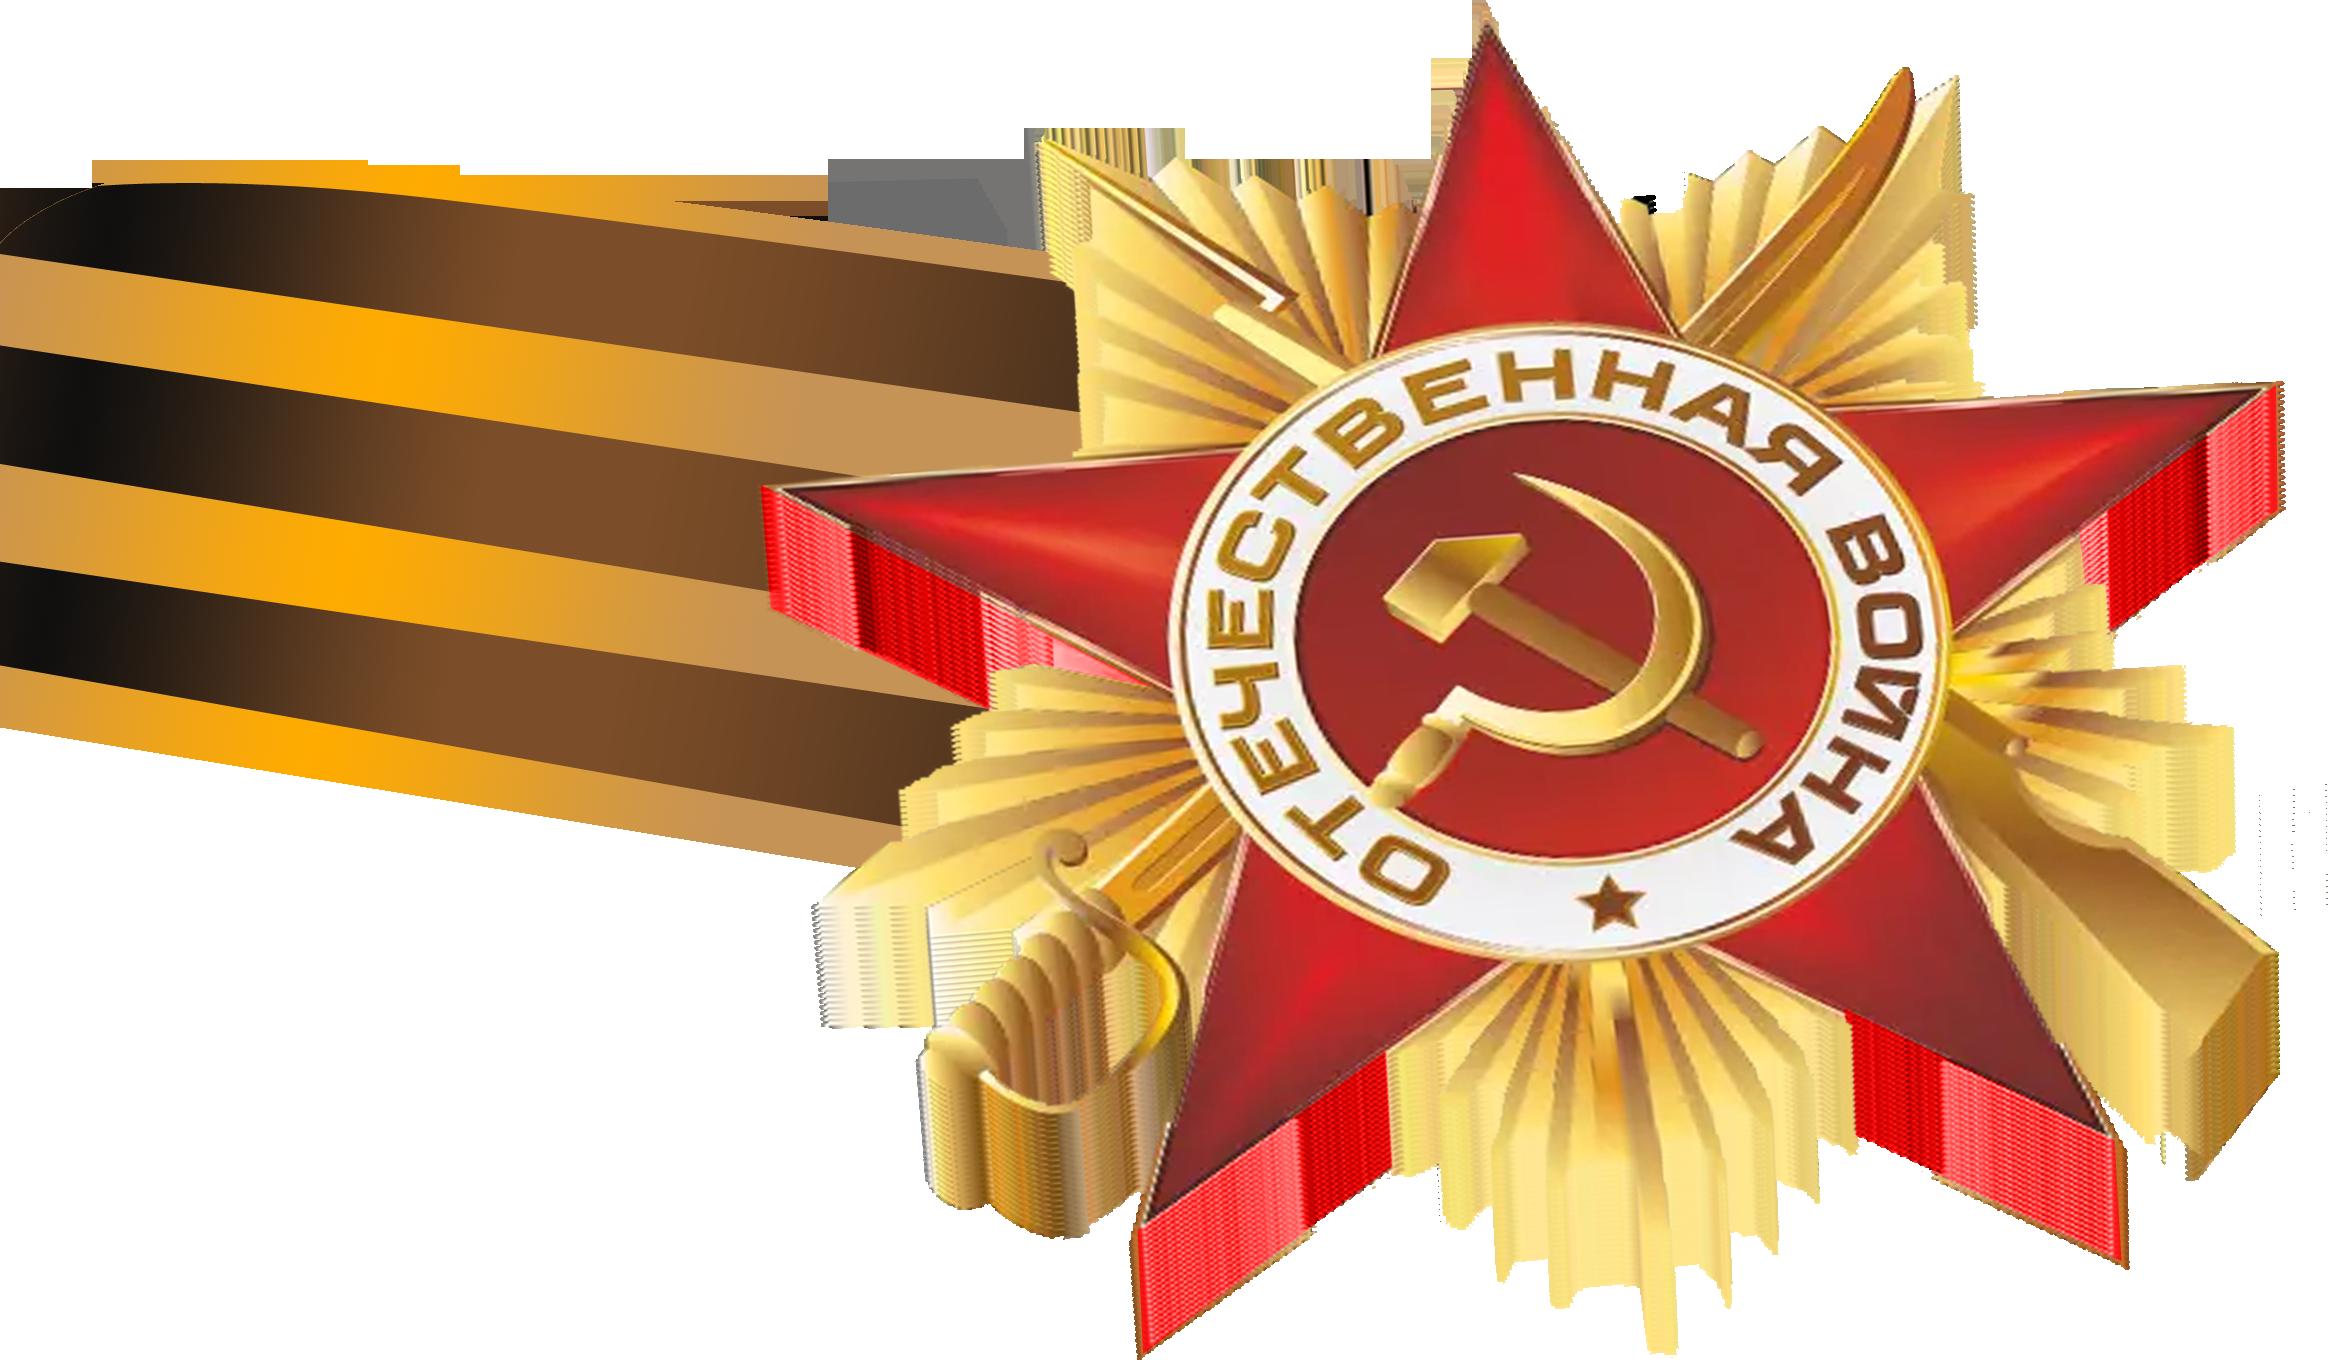 Логотип ННТВ (09.05.2015; 09.05.2016)